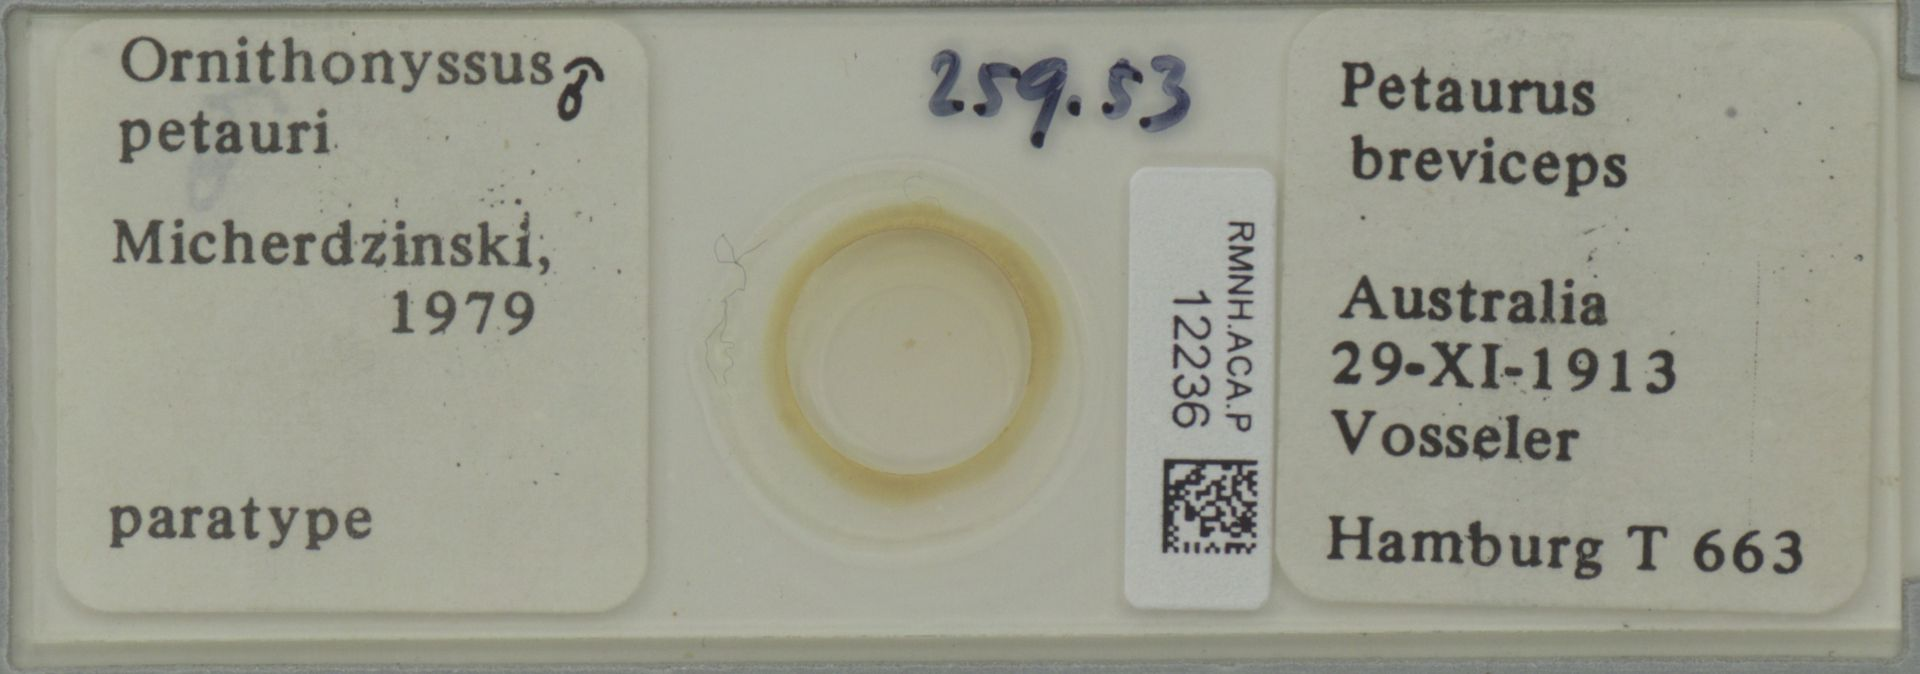 RMNH.ACA.P.12236   Ornithonyssus petauri Micherdzinski, 1979